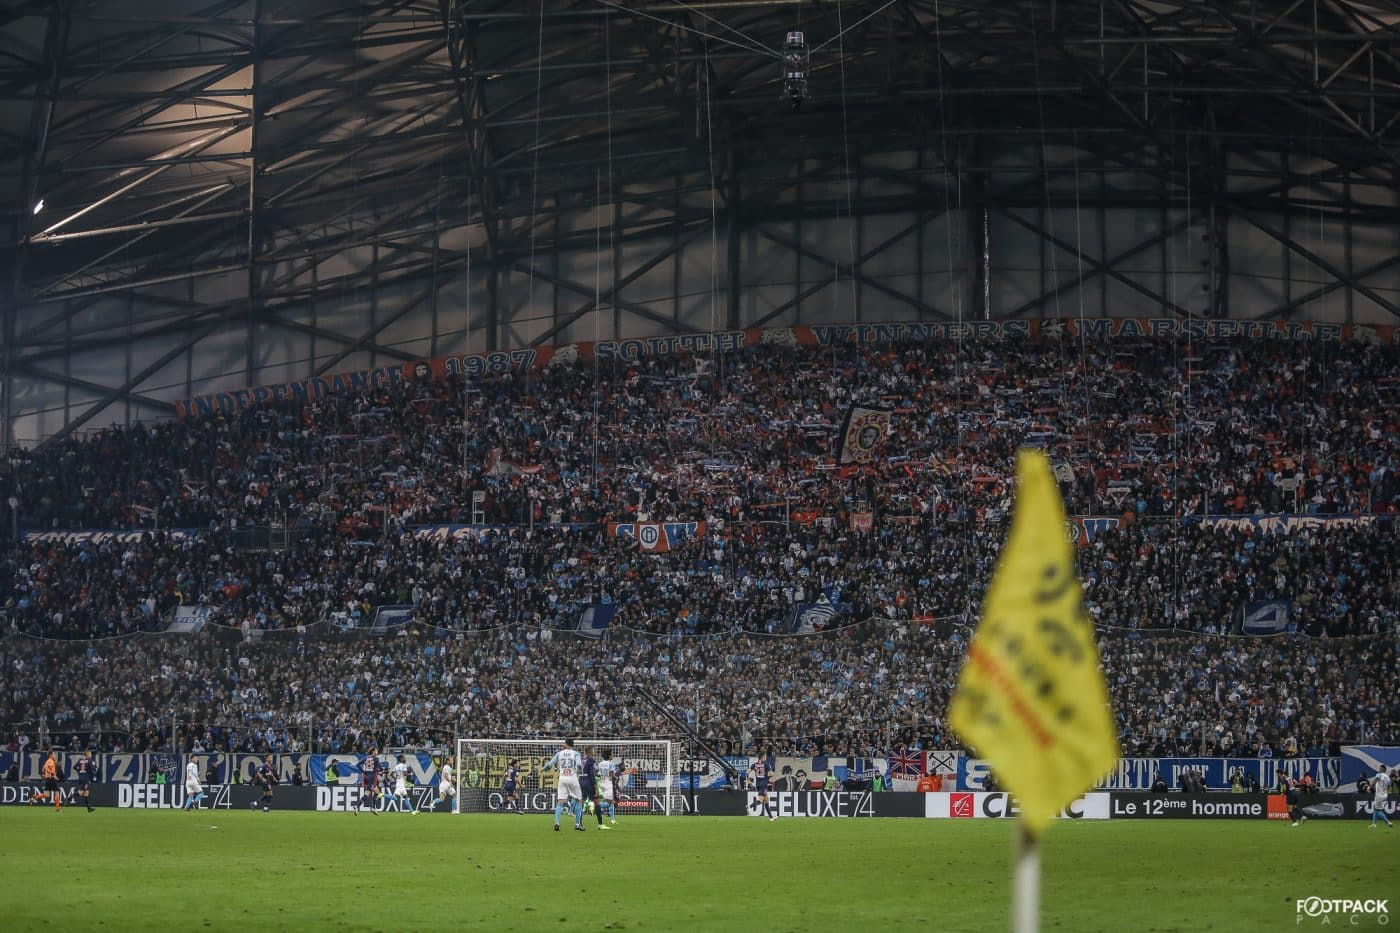 au-stade-marseille-paris-om-psg-footpack-45